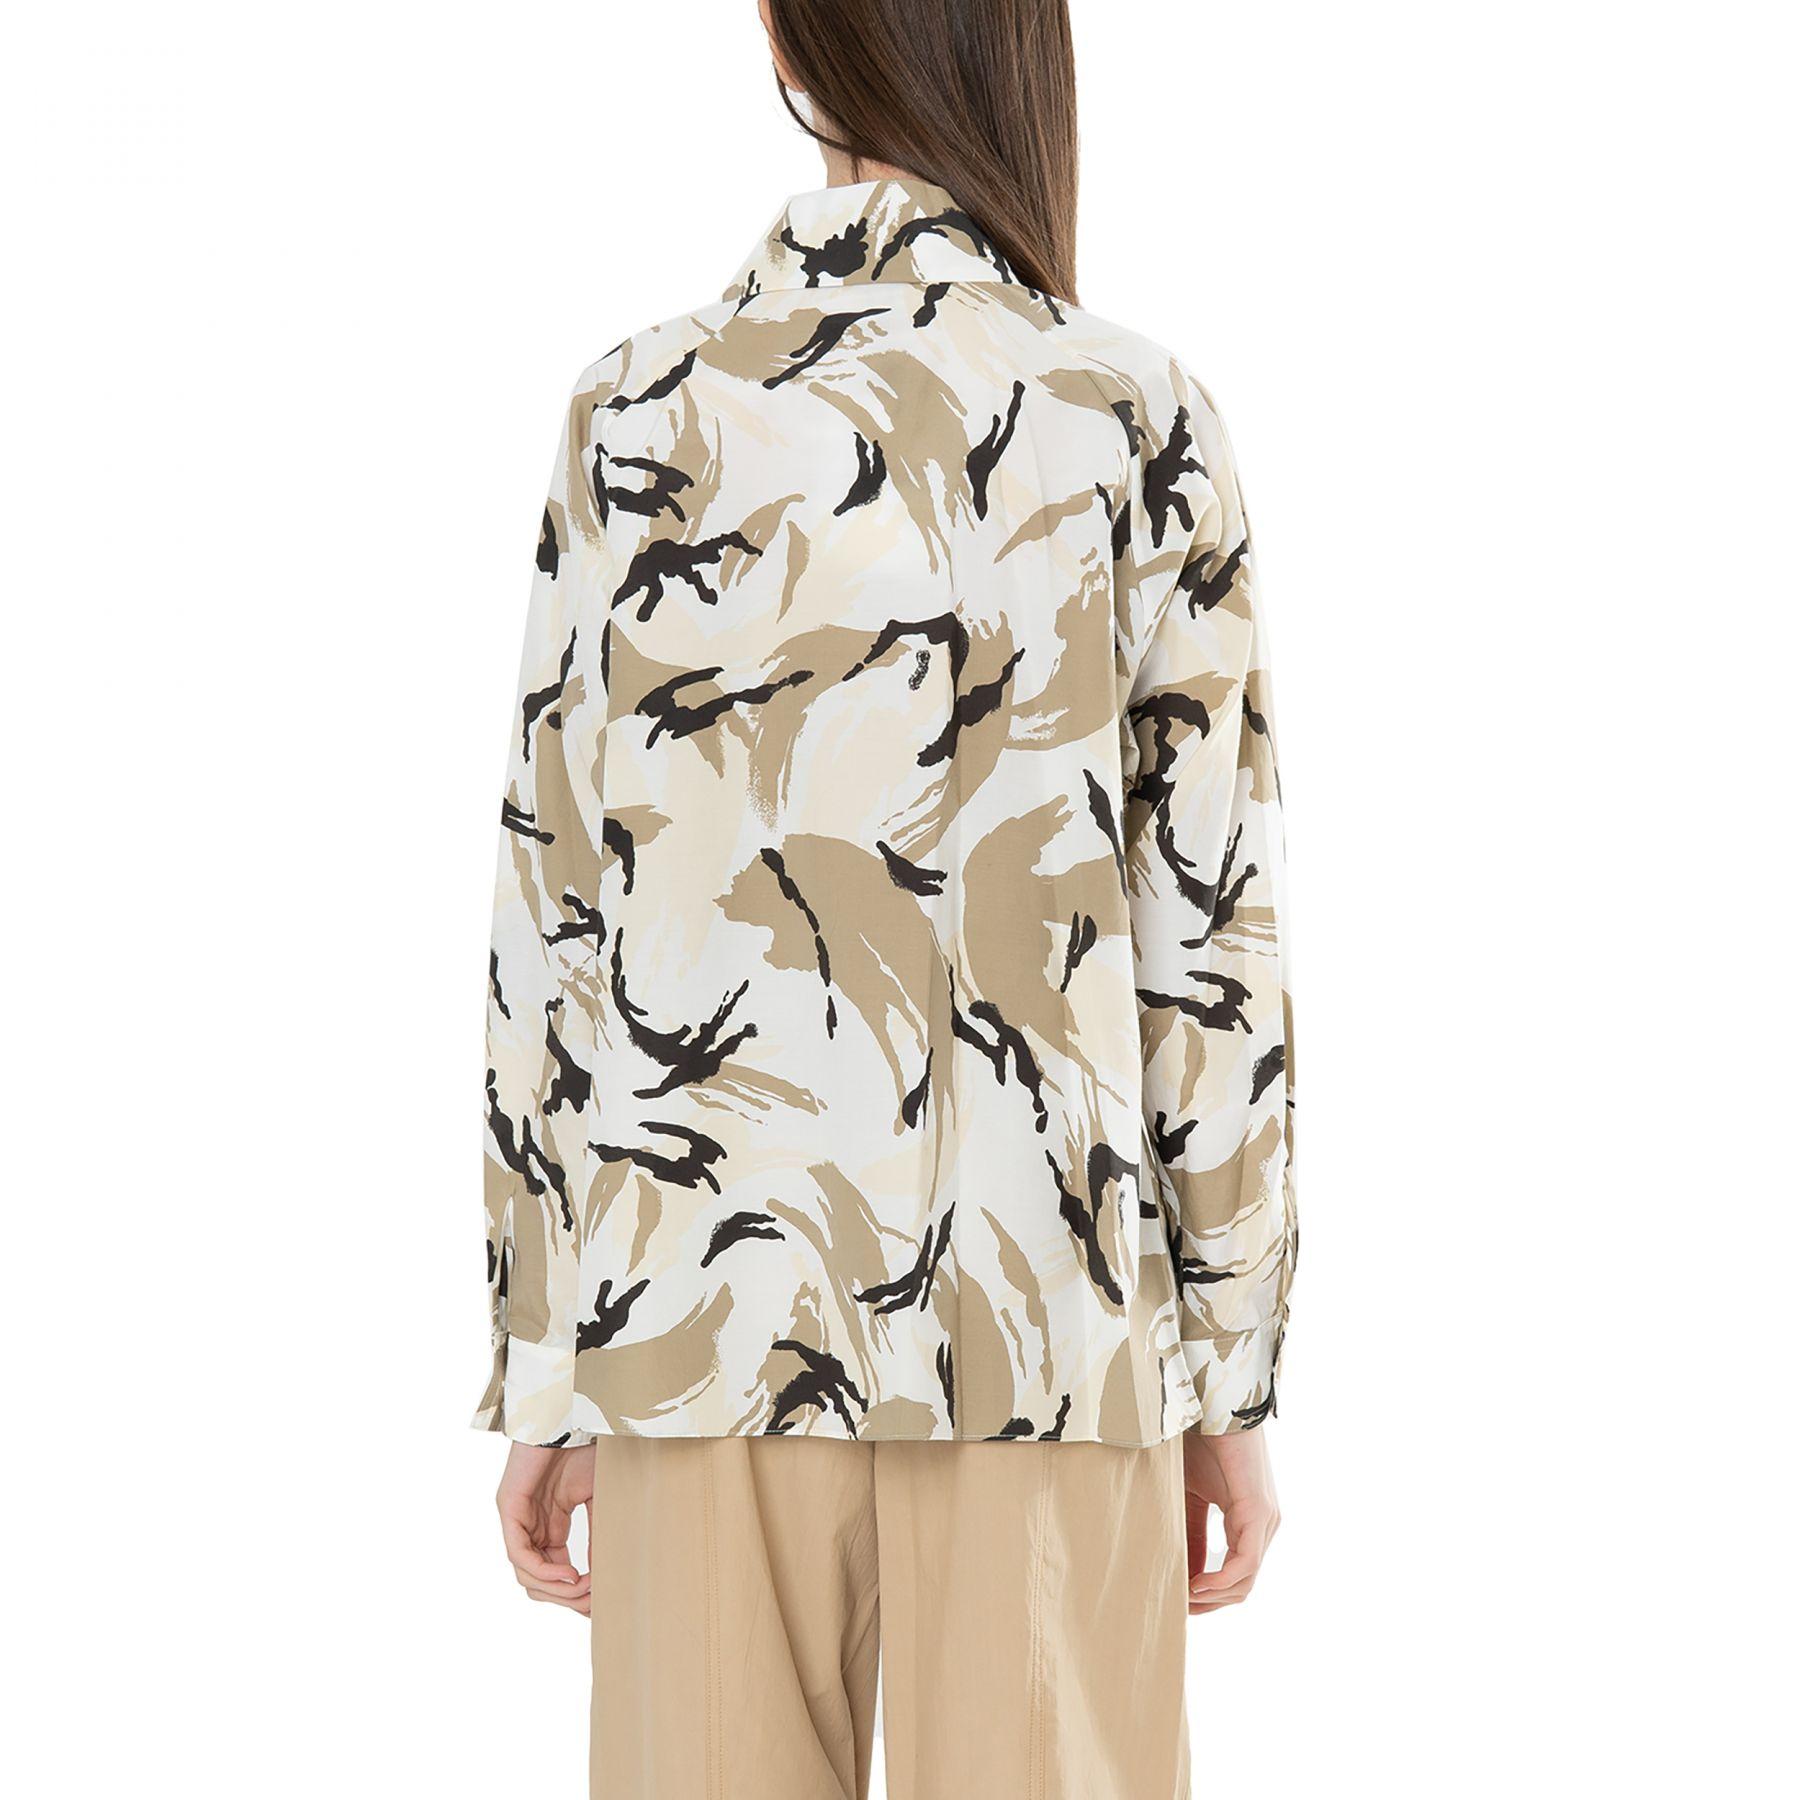 Рубашка с длинными рукавами Kenzo бело-бежевая